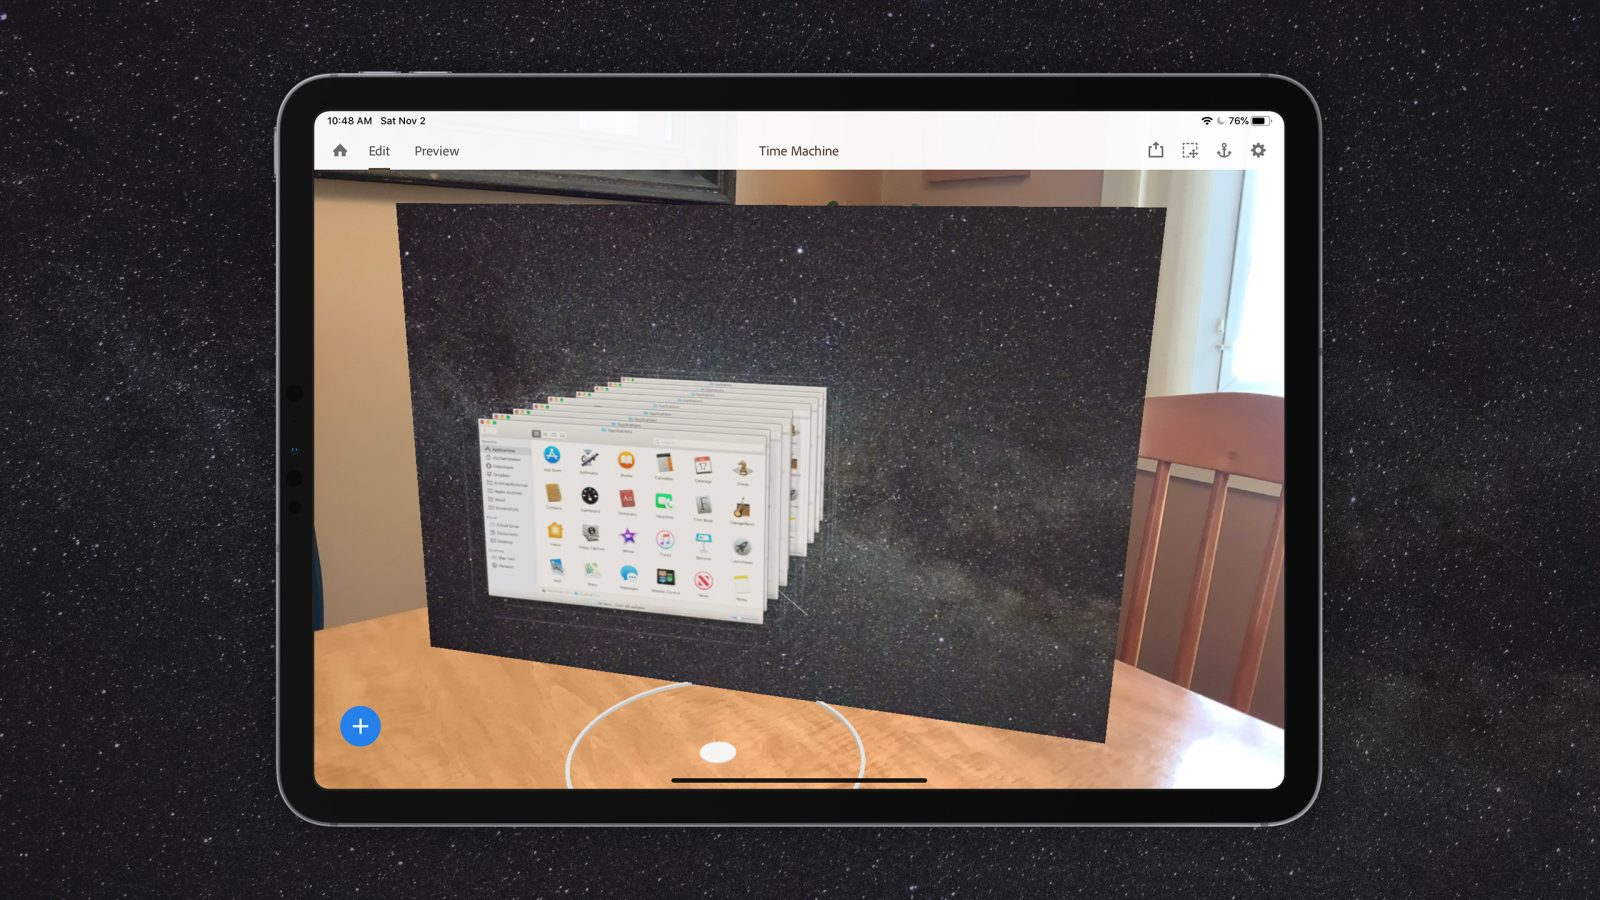 Hands-on with Aero, Adobe's new AR creation app